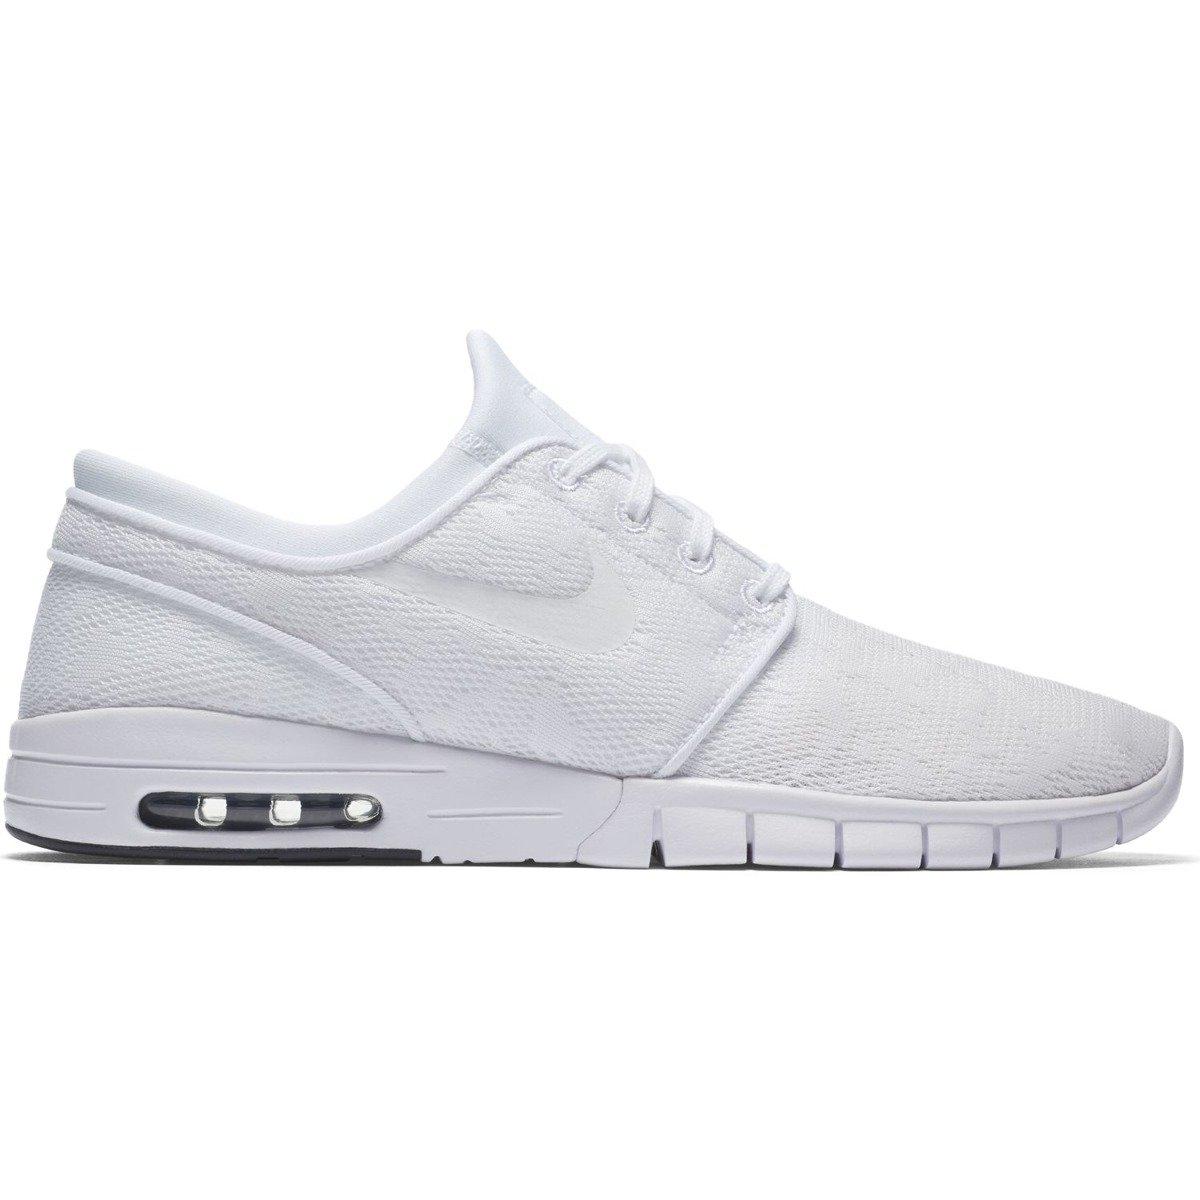 108a7ed1ae87 shoes nike sb stefan janoski max WHITE WHITE-OBSIDIAN Click to zoom ...